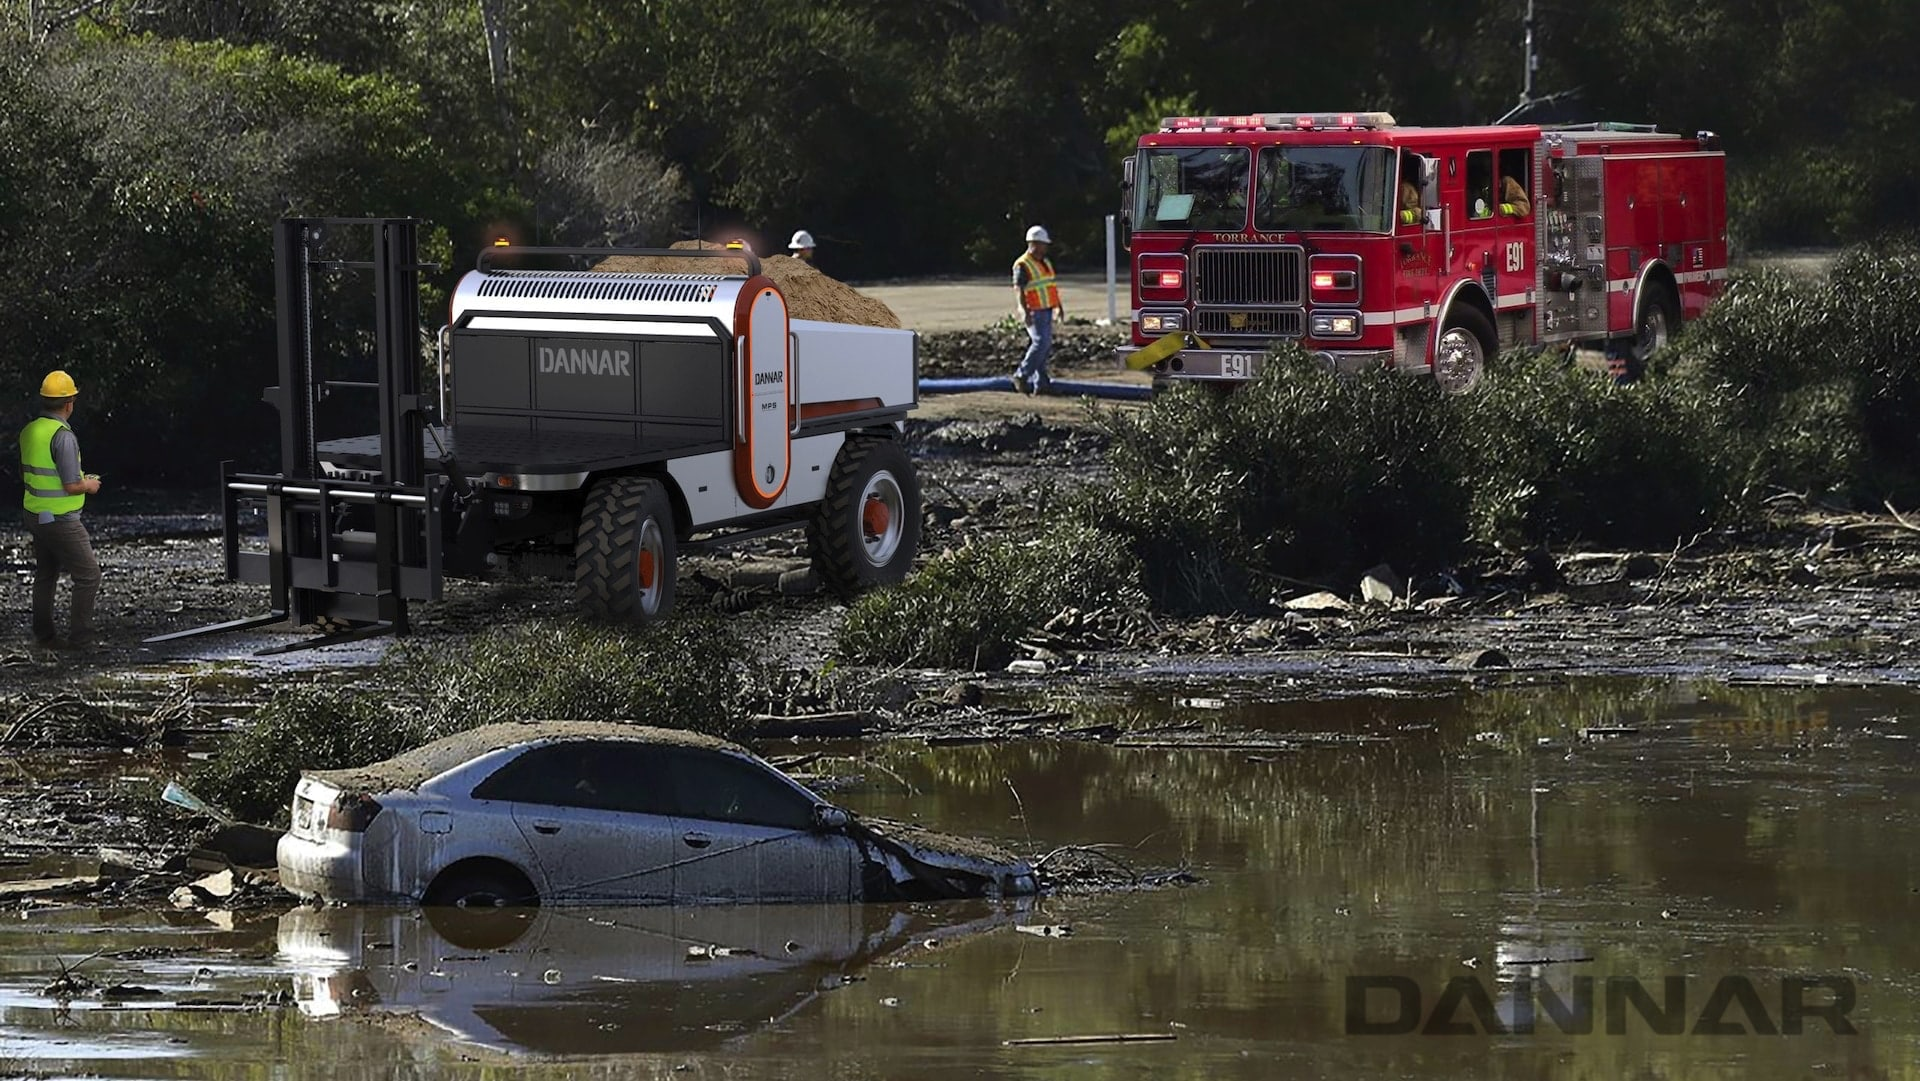 DANNAR MPS 400 Revolutionary Work Vehicle Disaster Response